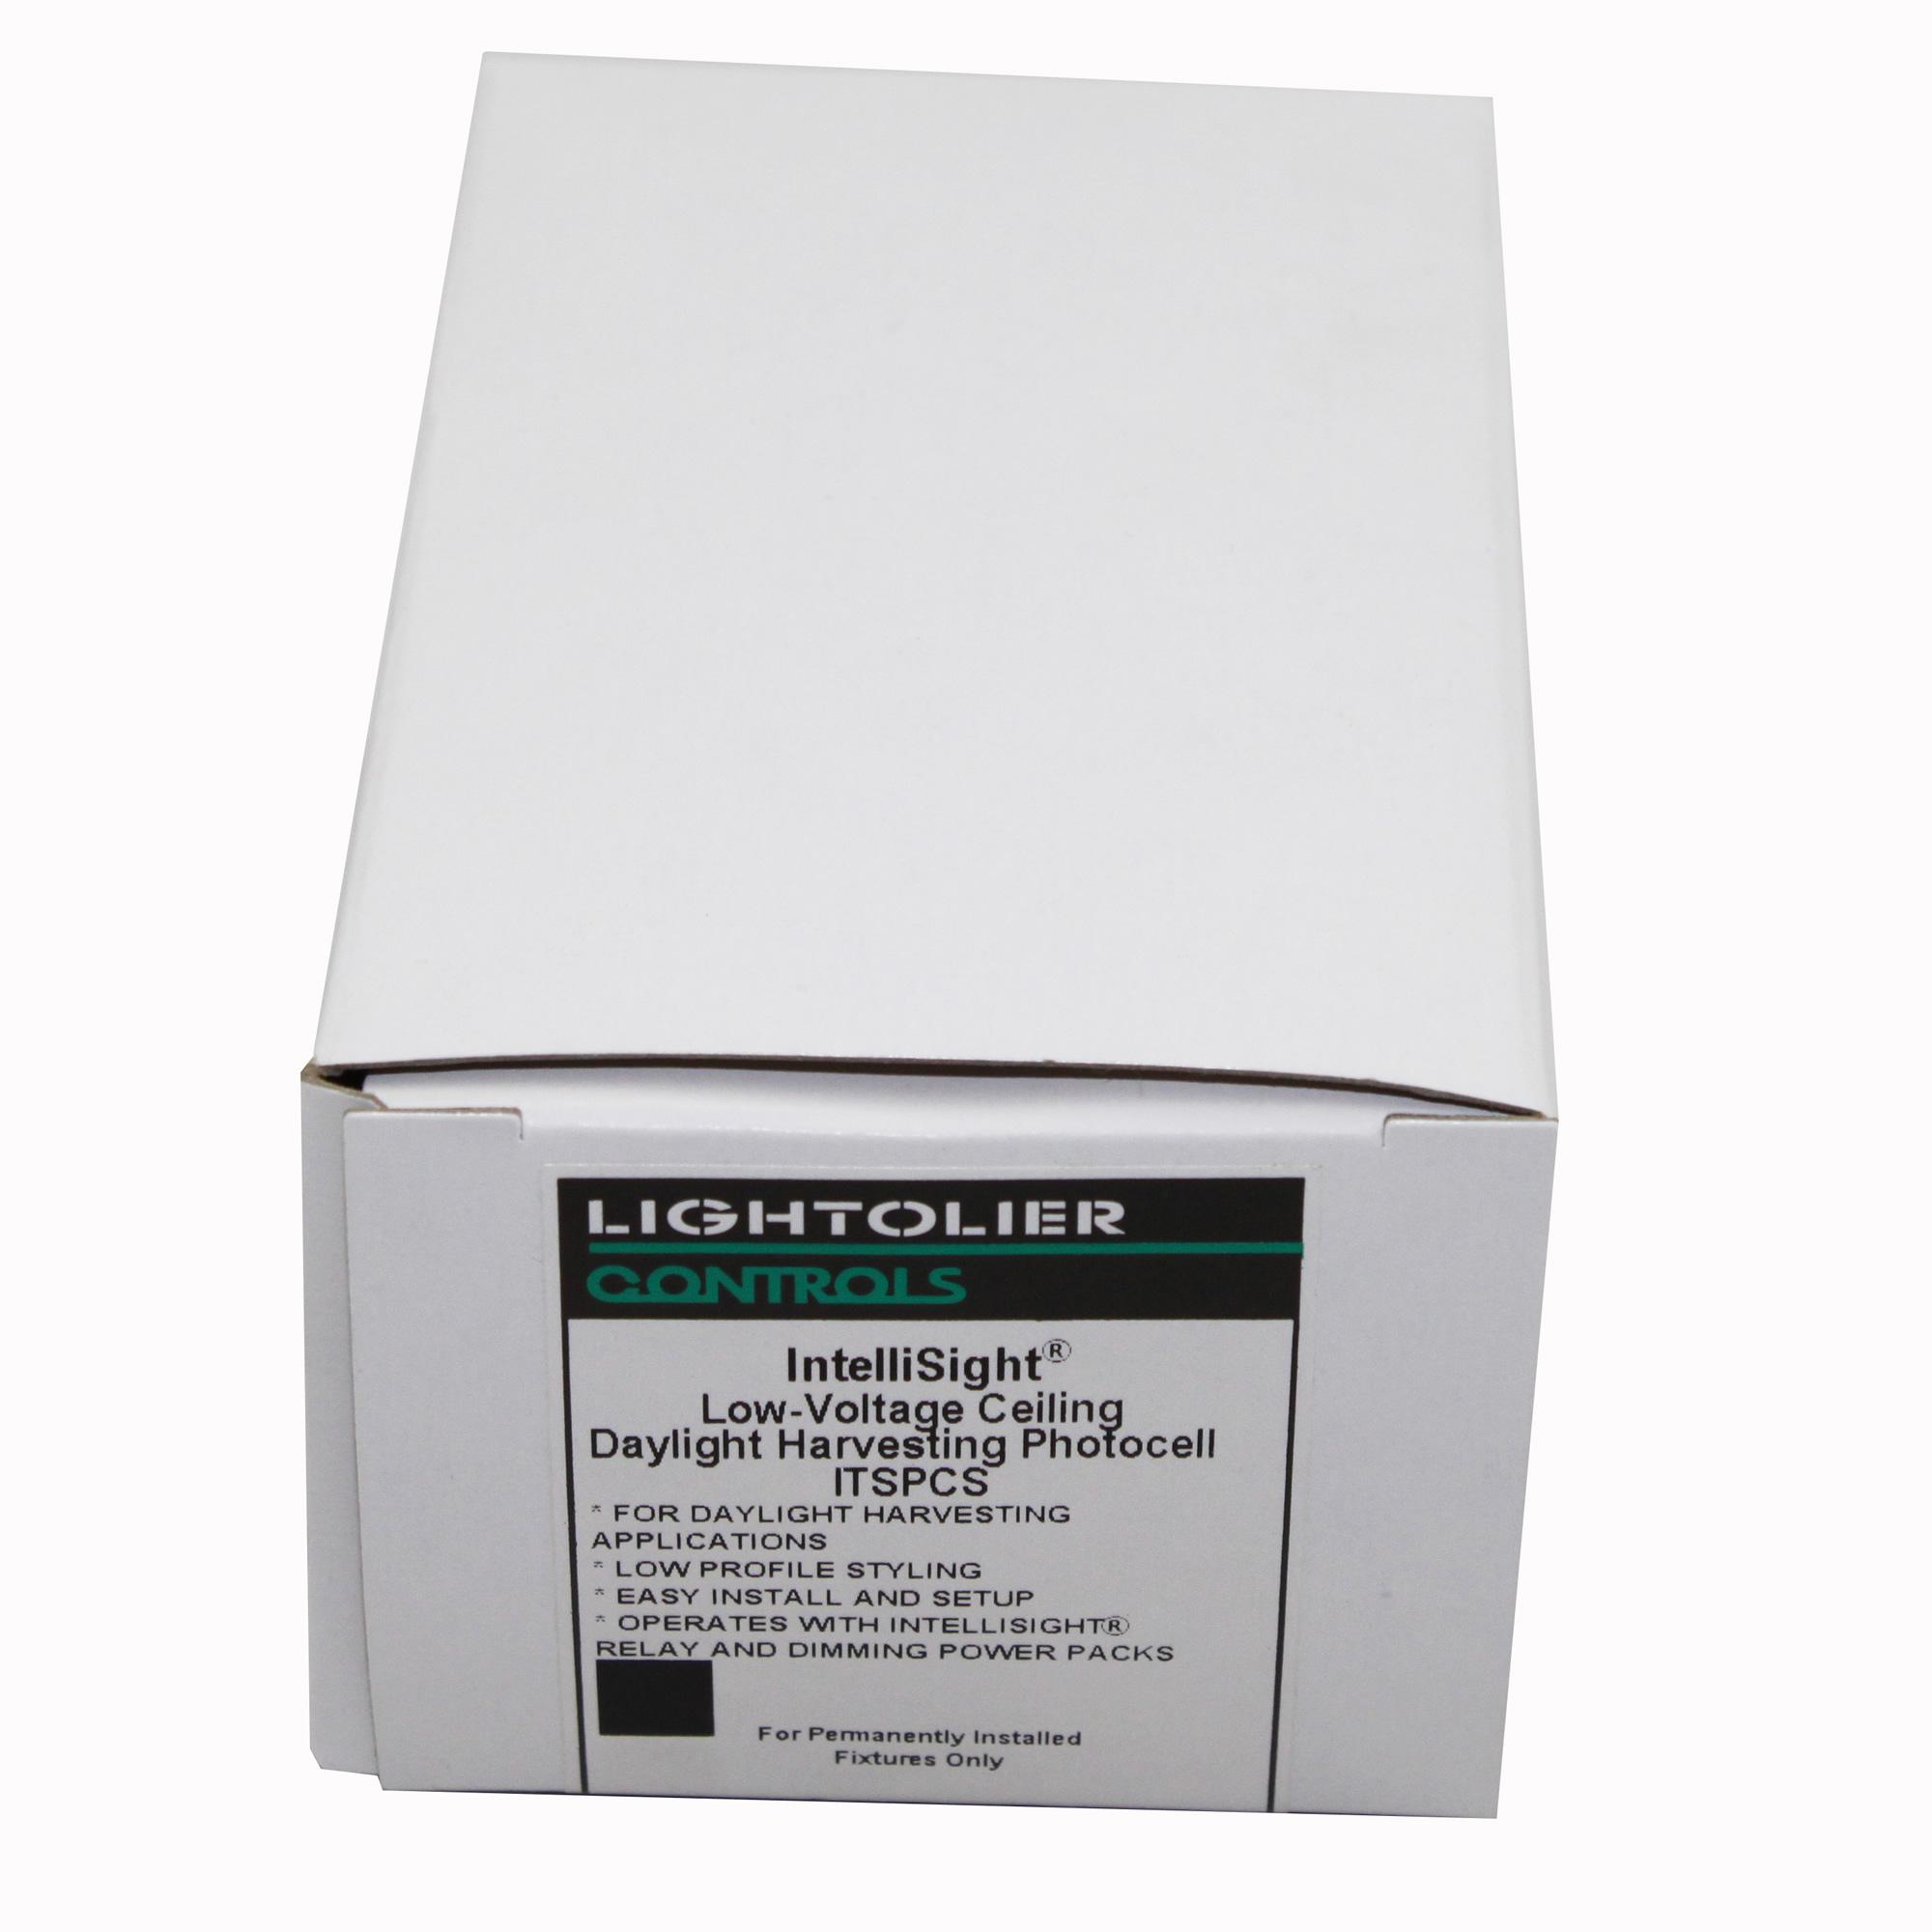 Intellisight Lightolier Itspcs Low Voltage Photocell